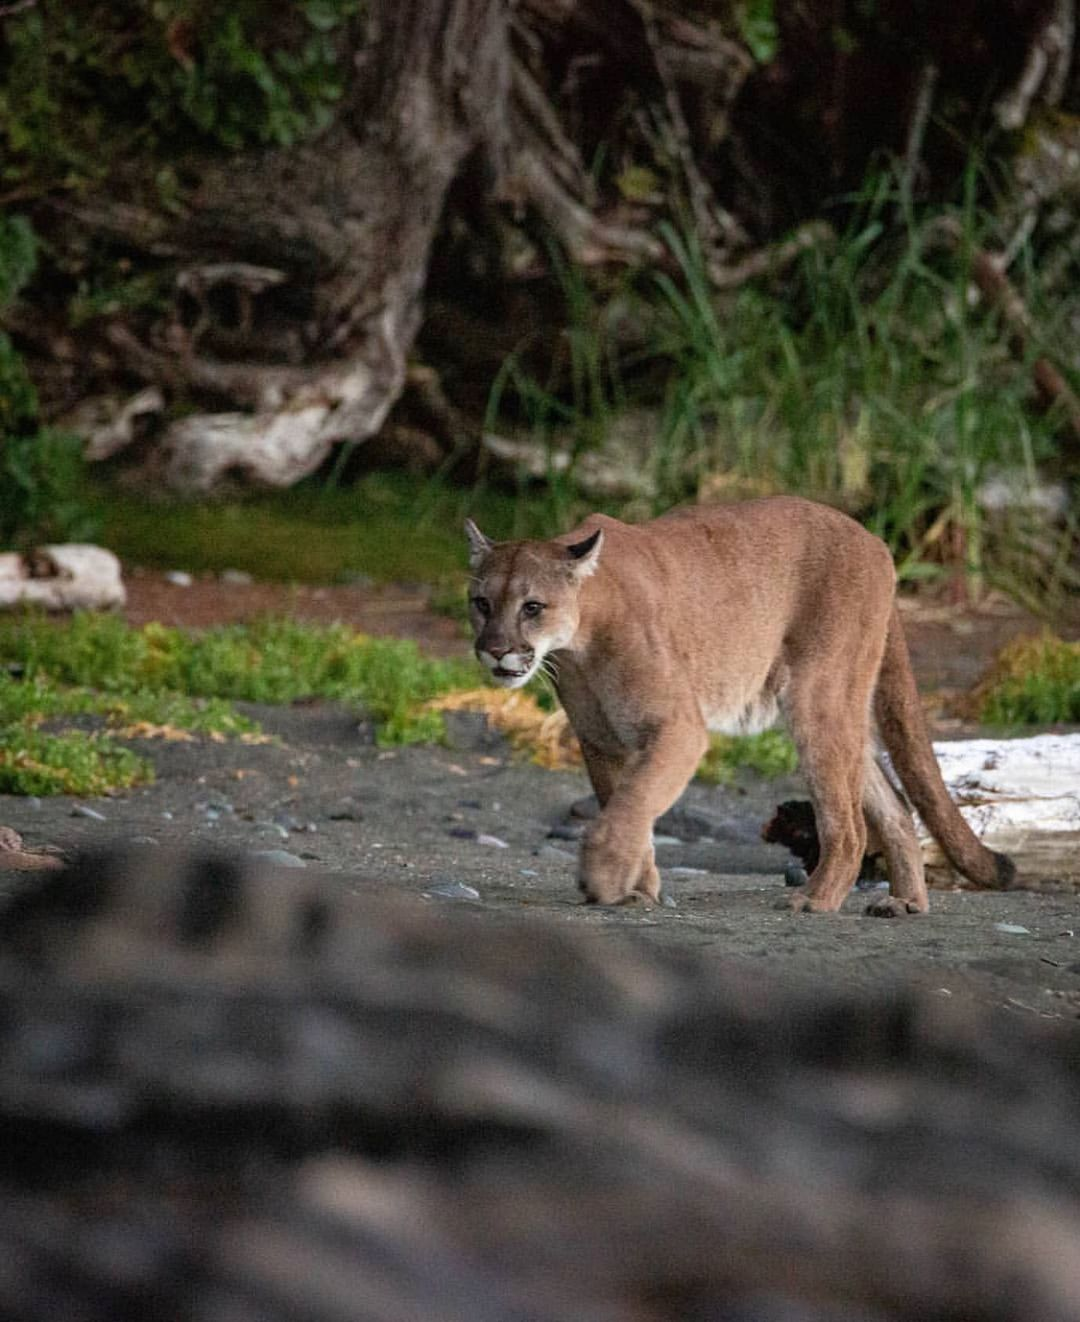 A beautiful brown cougar is seen walking along